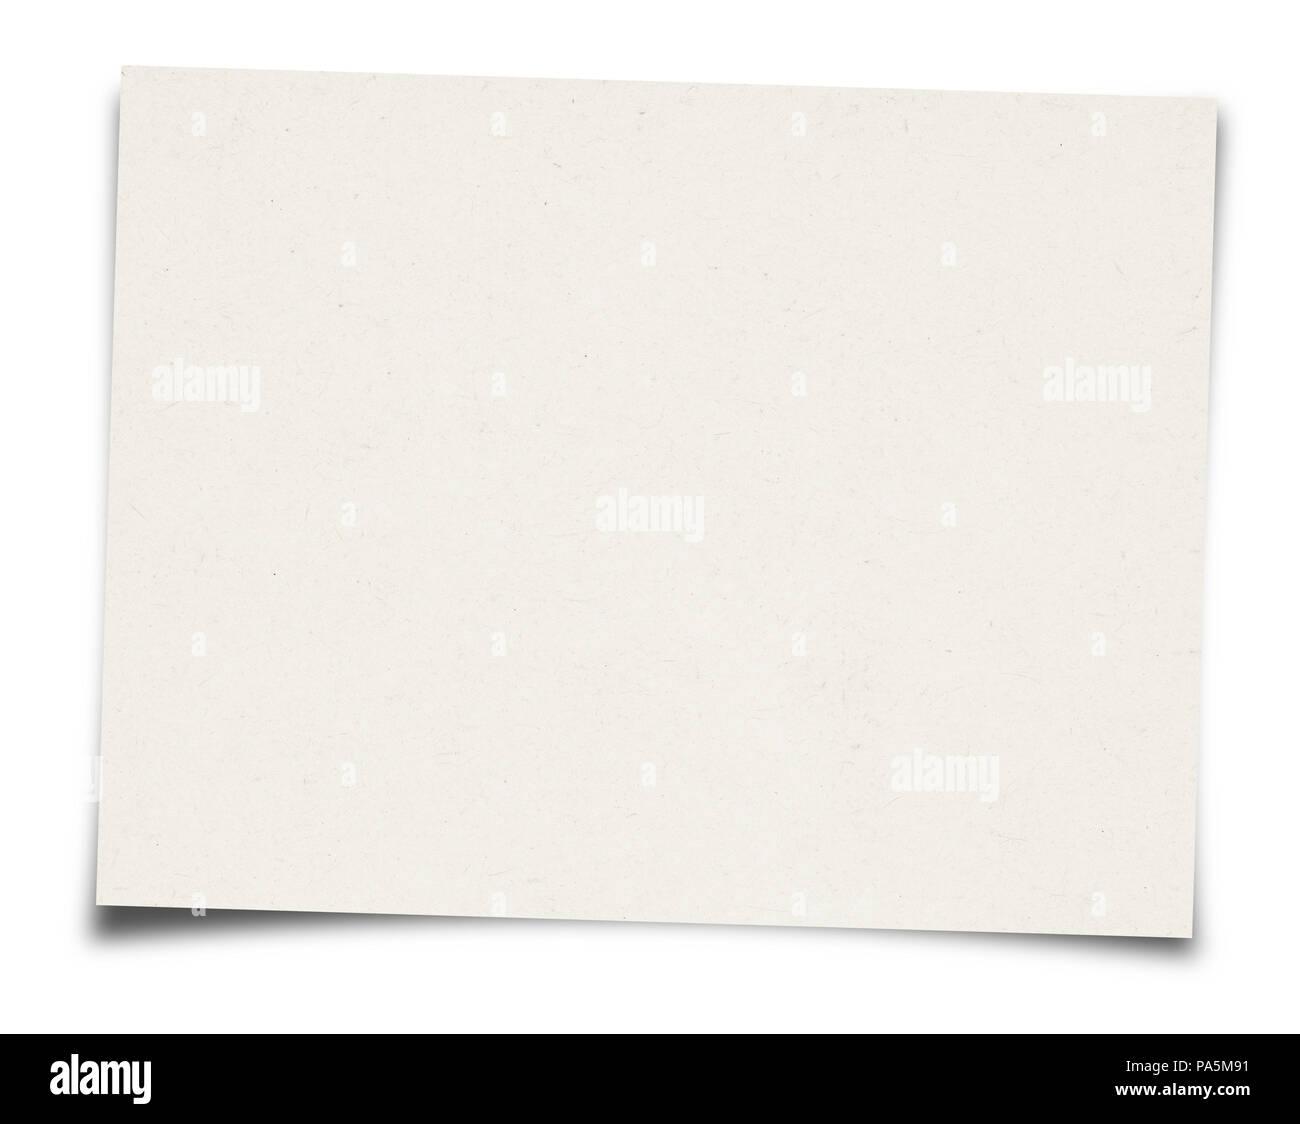 White Paper sheet isolated on white background - Stock Image